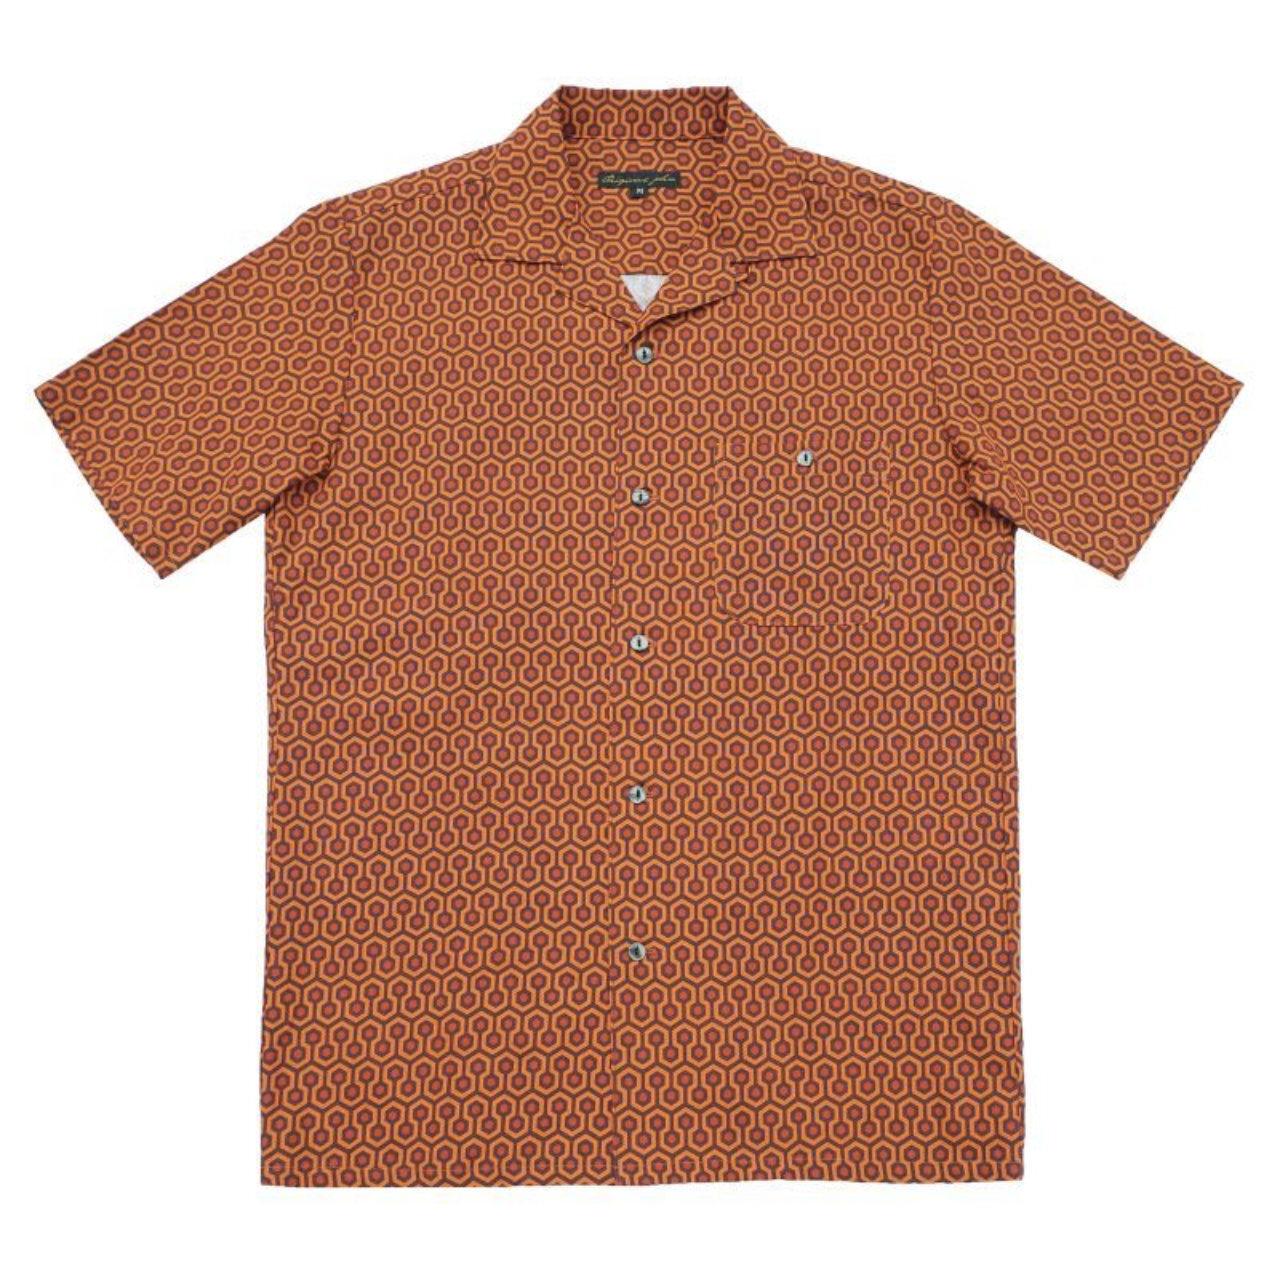 【Original John】 半袖オープンカラーシャツ THE SHINING オーバールックホテル 〈Orange〉